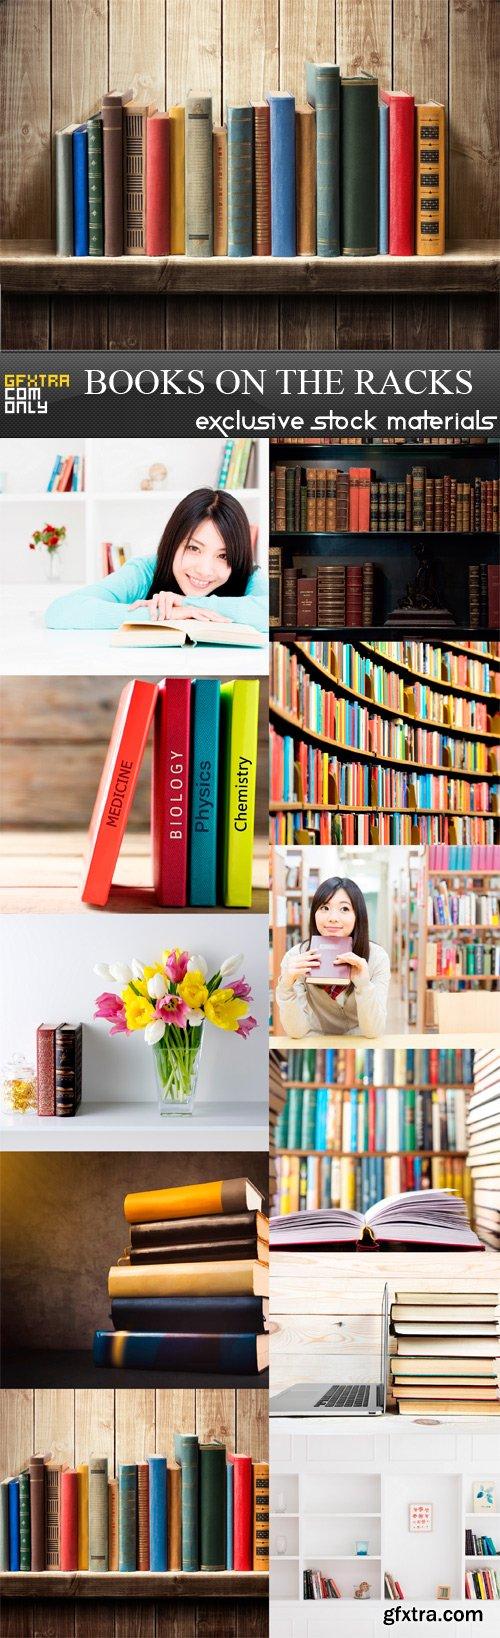 Books On The Racks - 11 x JPEGs